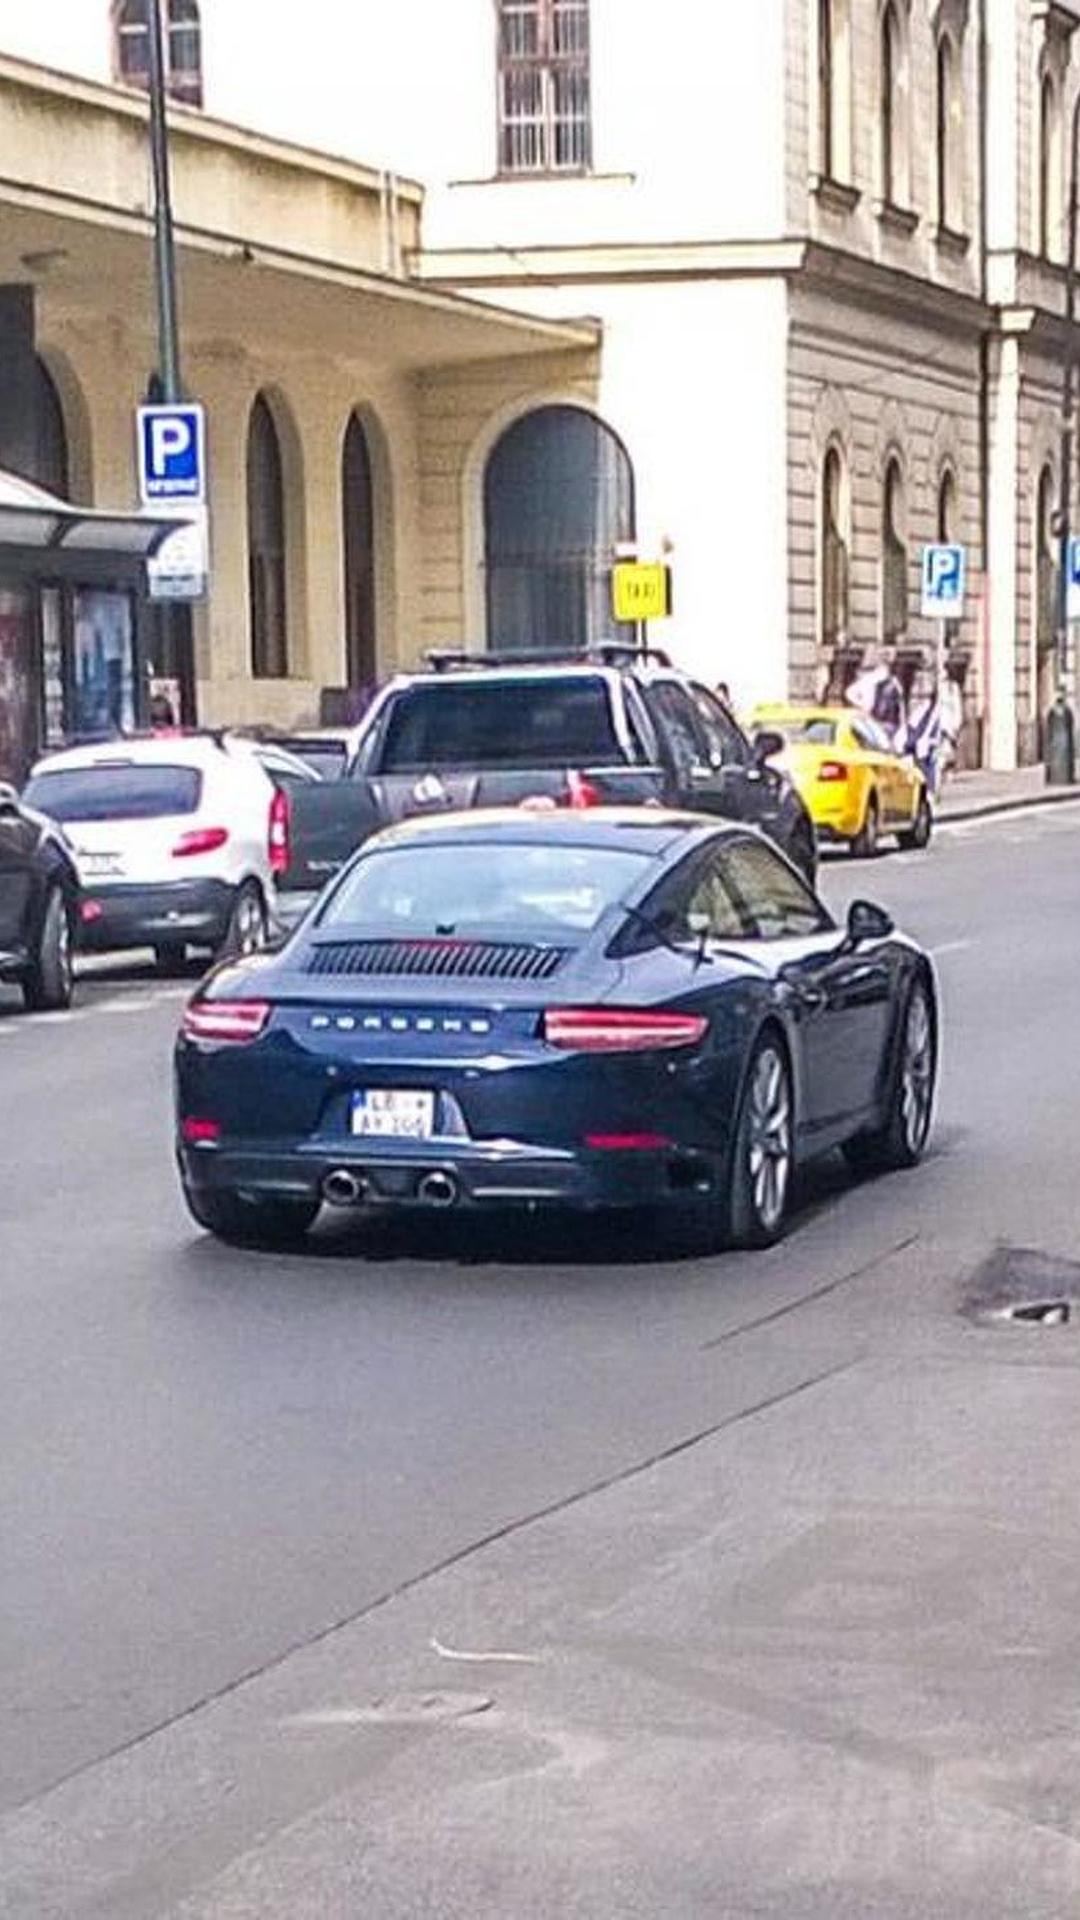 Undisguised Porsche 911 facelift spotted in Prague